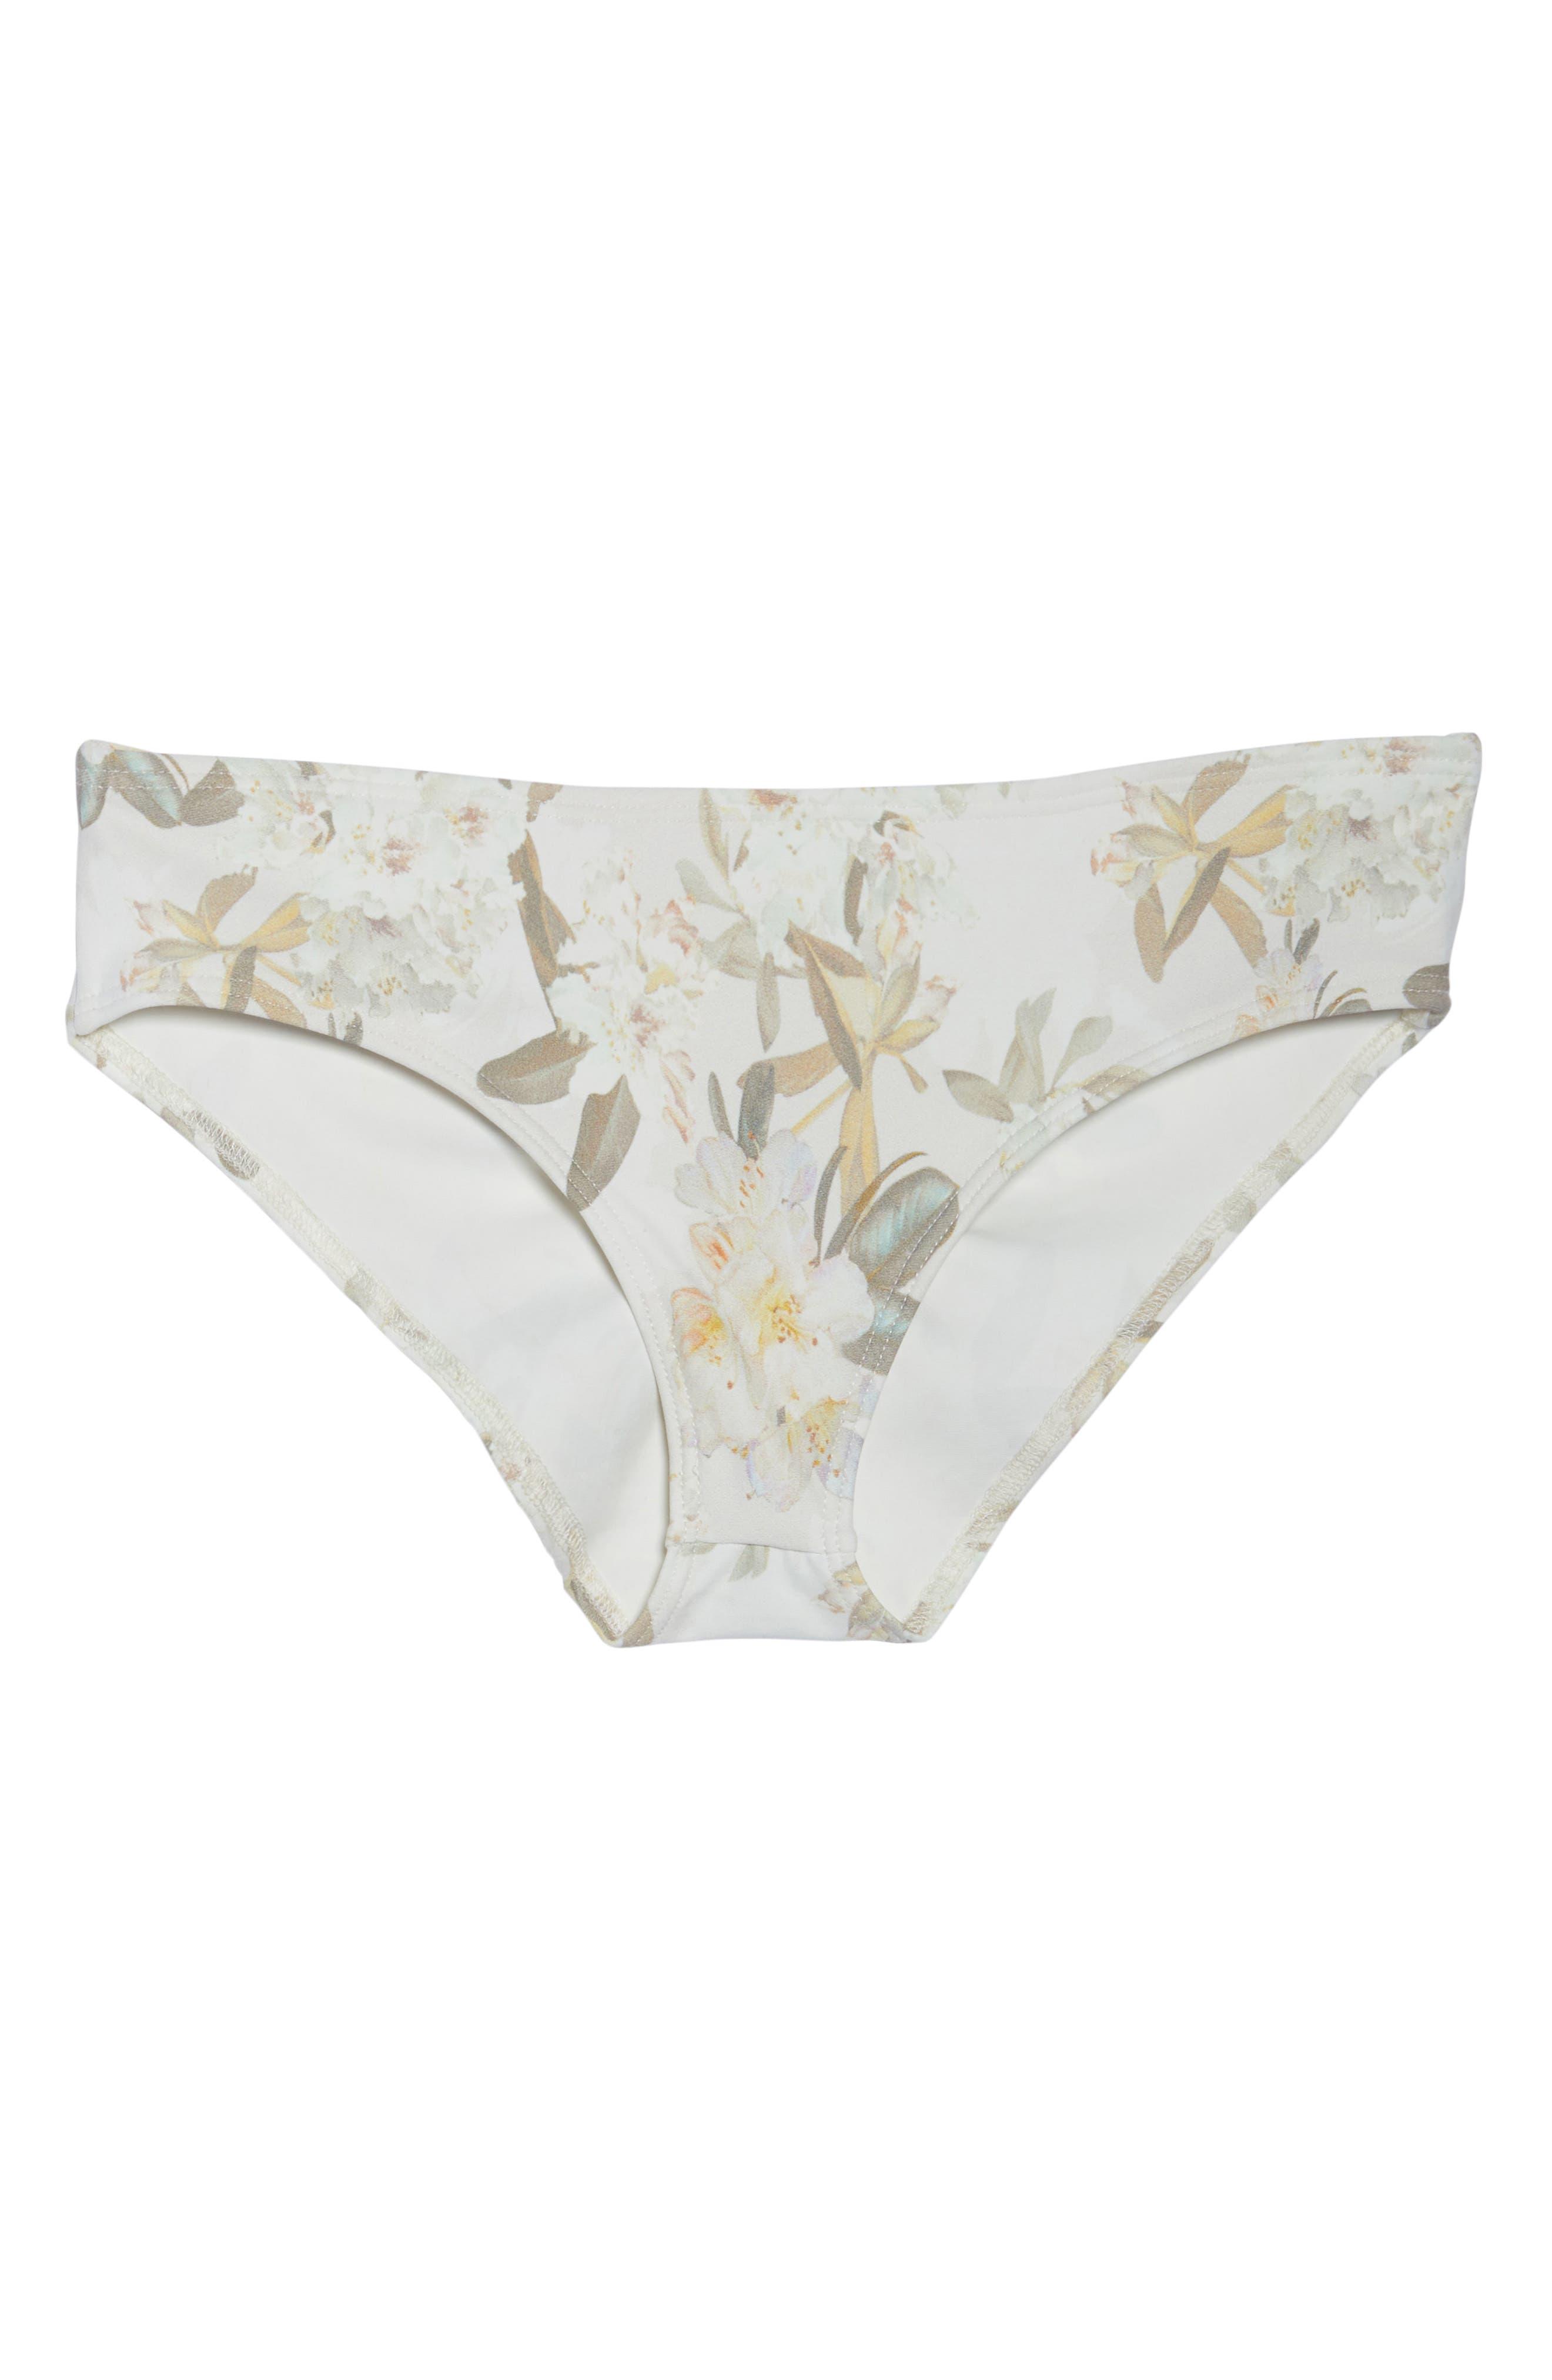 AC Nu Micro Bikini Bottoms,                             Alternate thumbnail 9, color,                             Ete Floral White